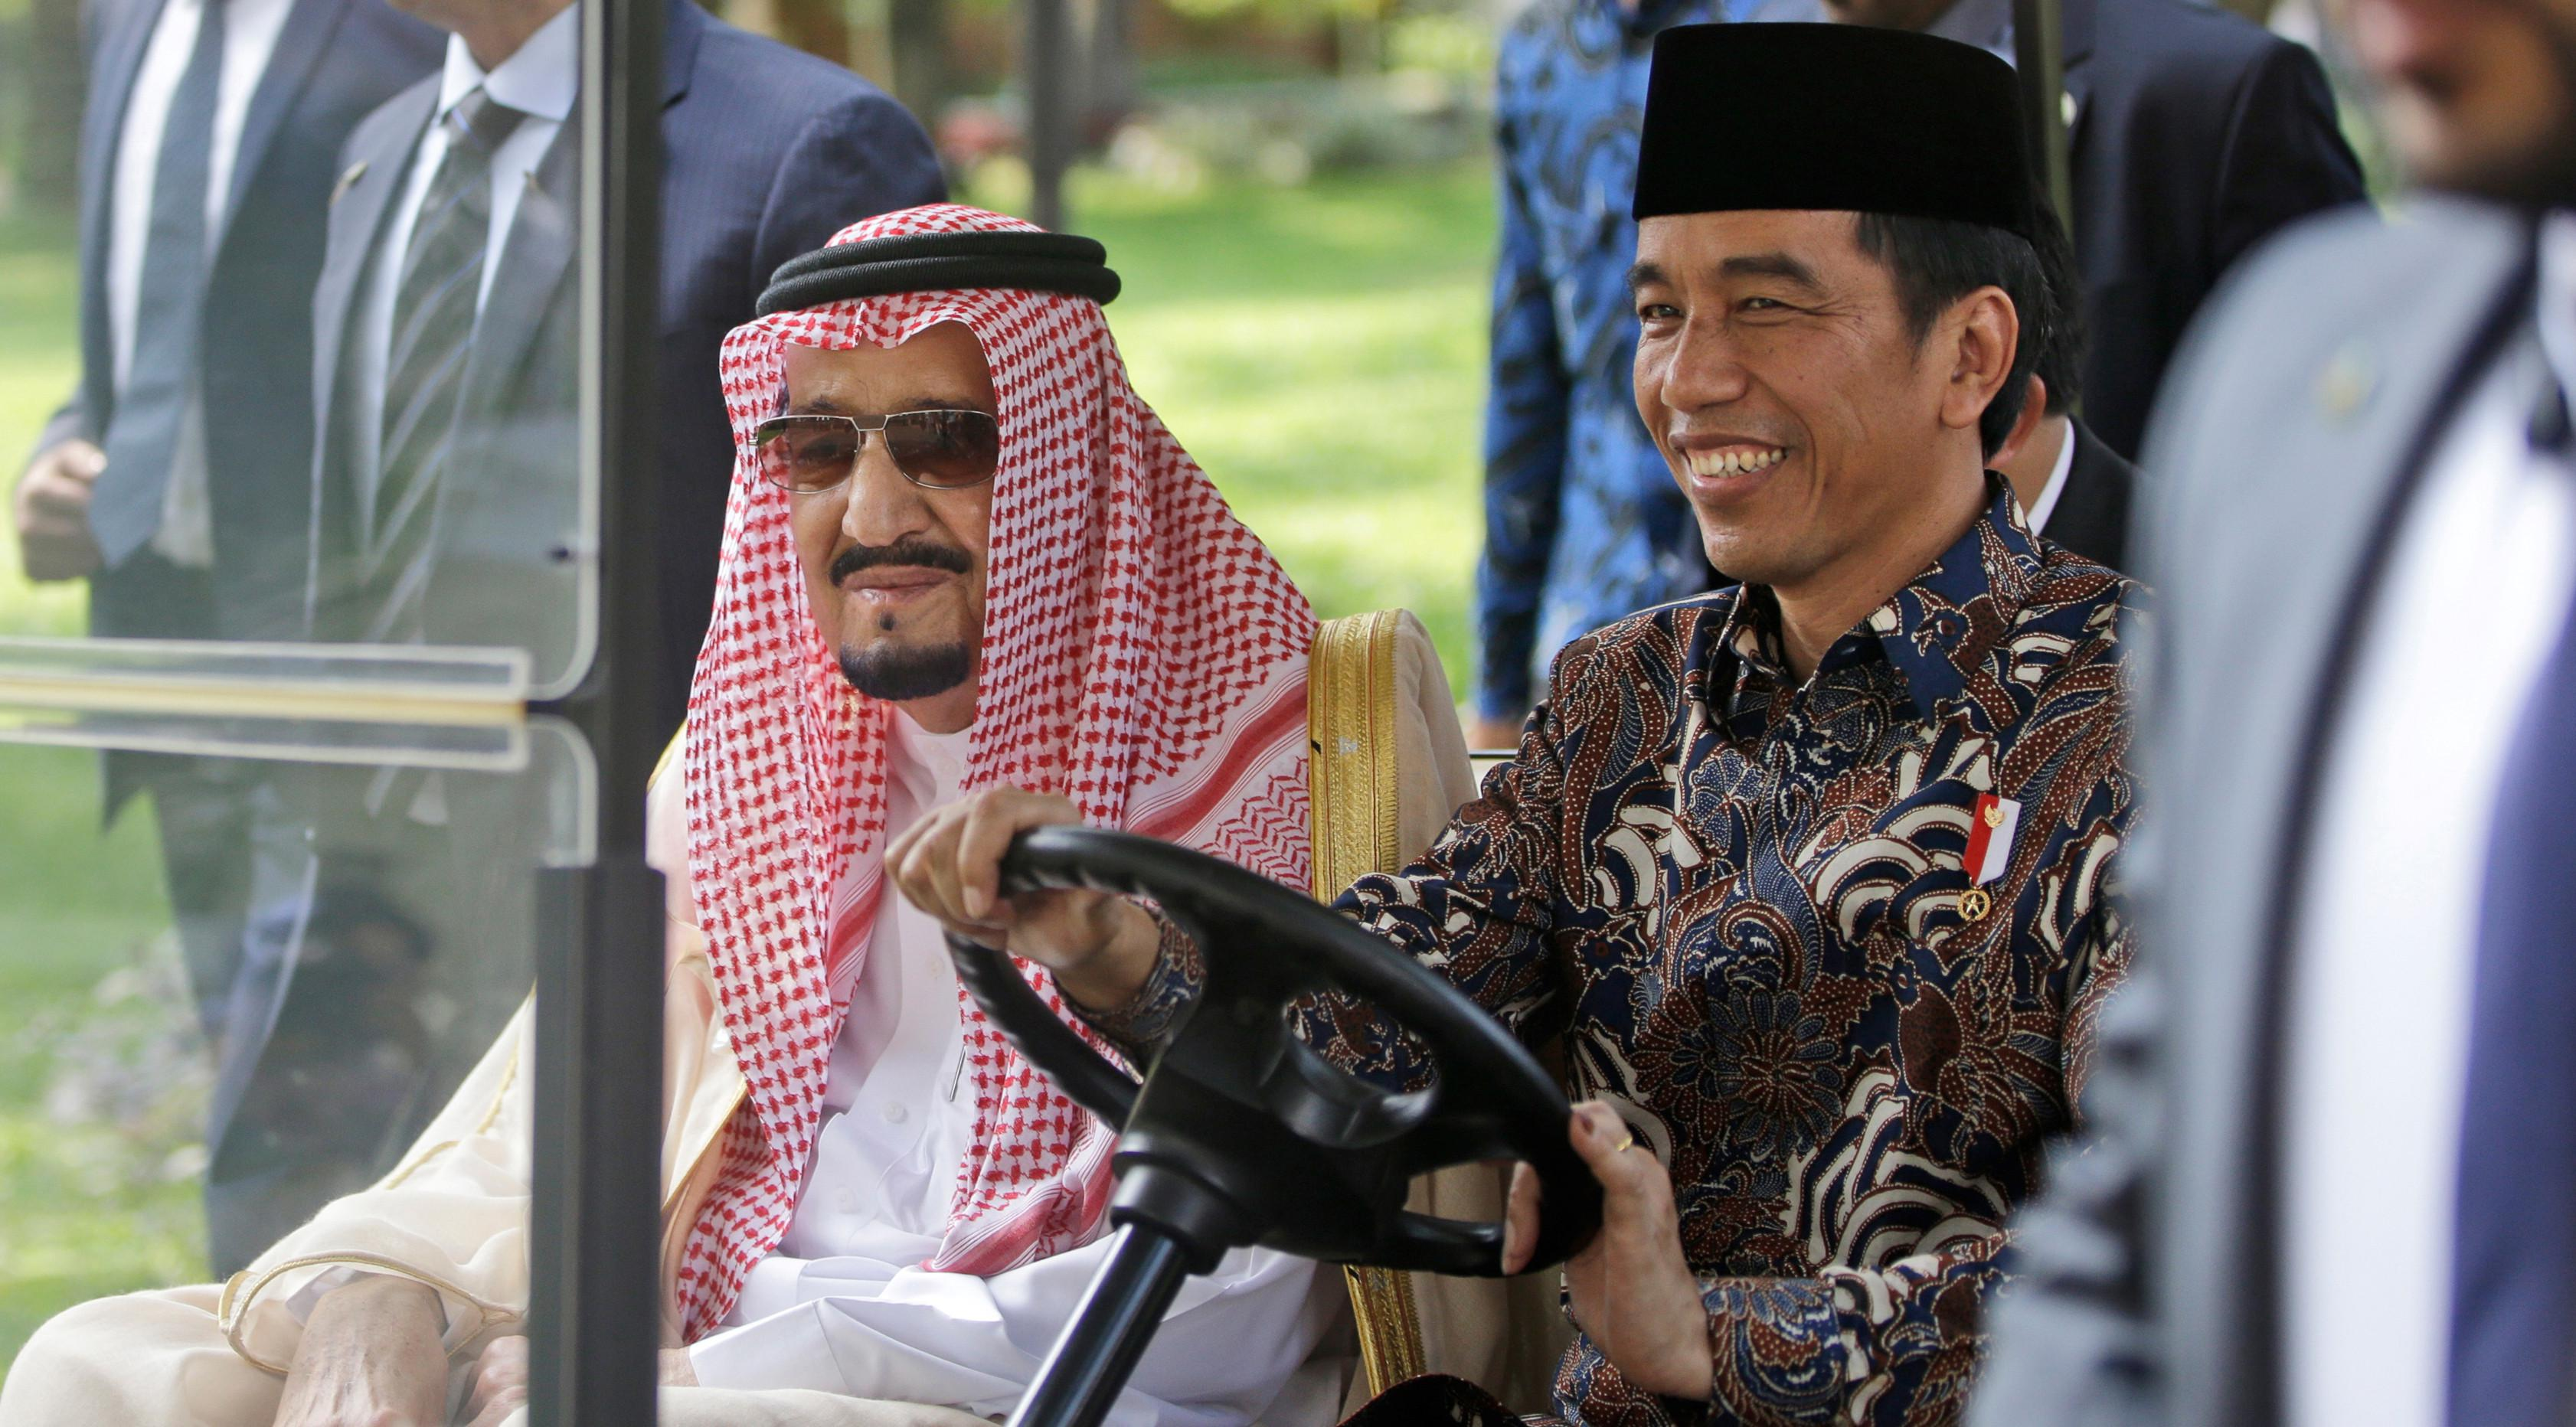 Presiden Jokowi mengajak Raja Salman bin Abdulaziz Al Saud keliling halaman Istana Merdeka dengan menaiki mobil golf, Jakarta, Kamis (2/3). (AFP Photo/ Pool/DITA ALANGKARA)